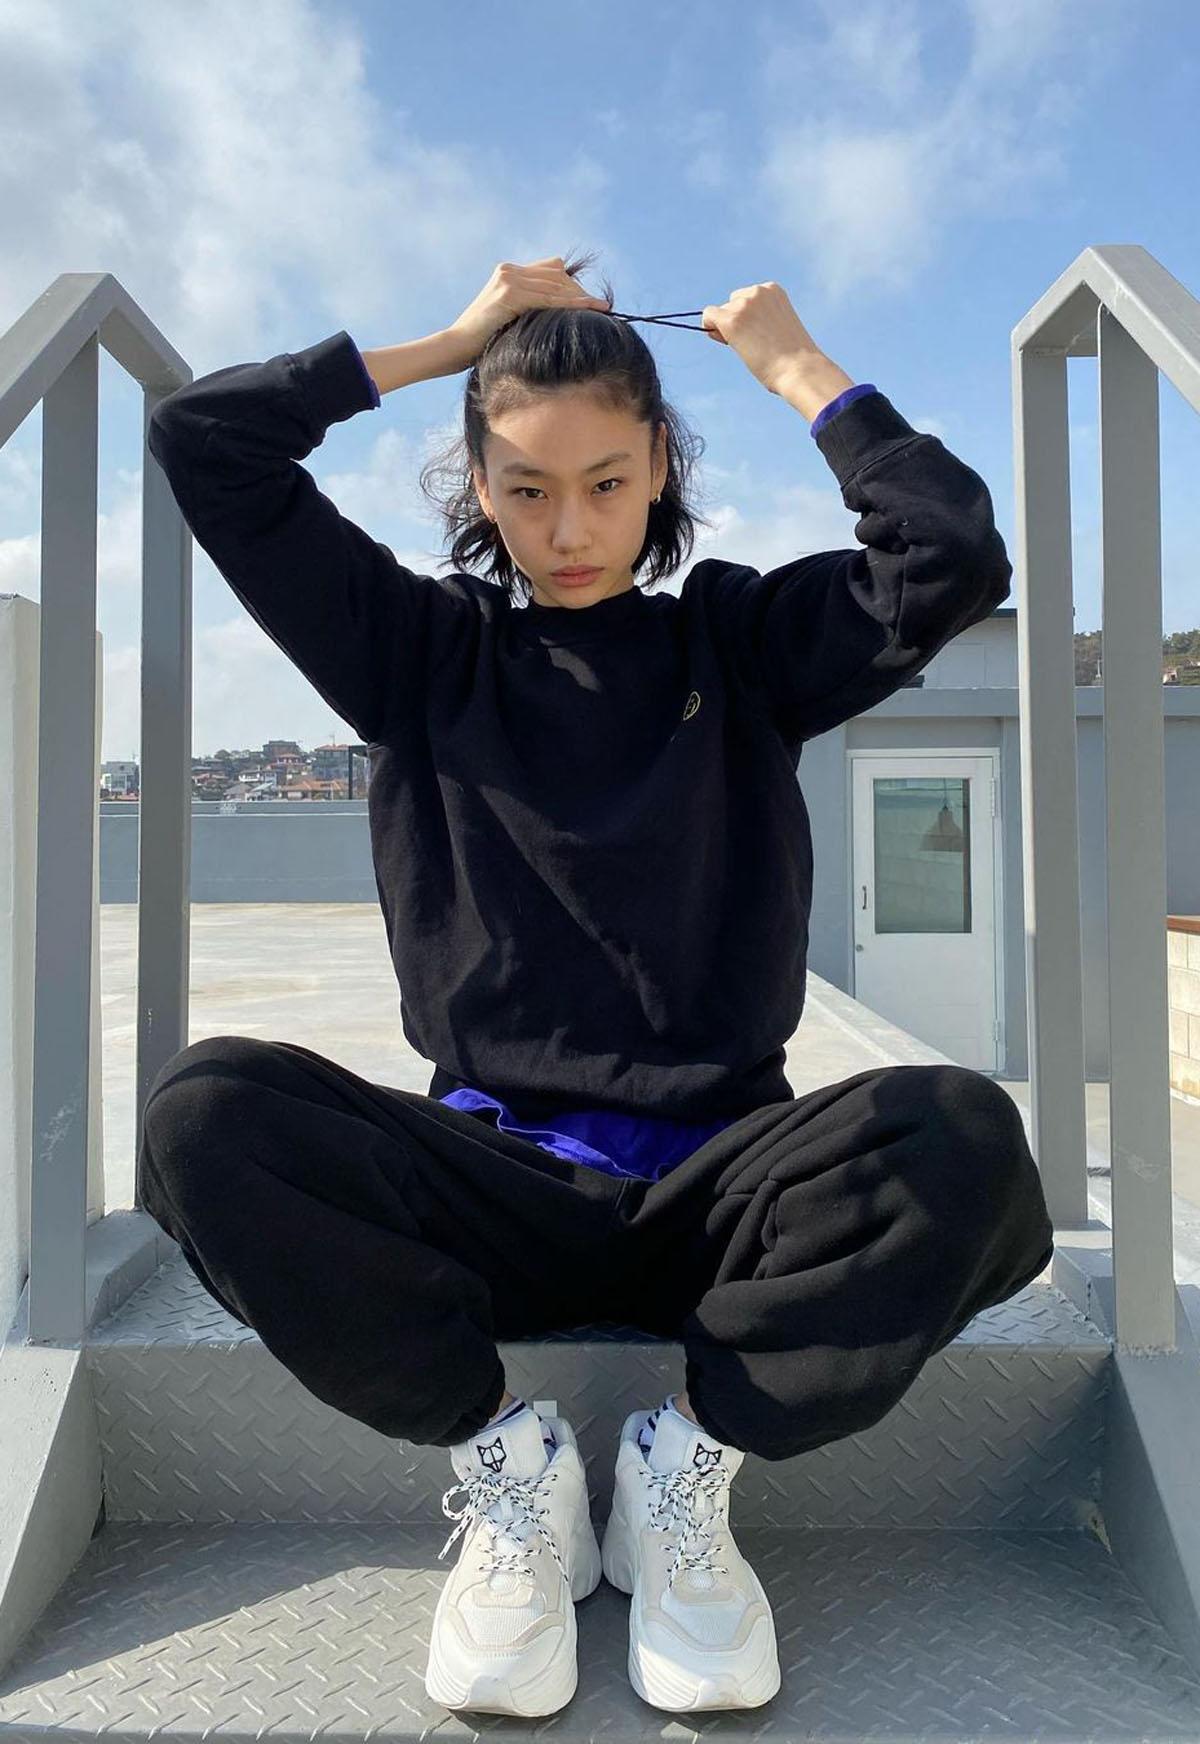 HoYeon Jung aka Kang Sae-byeok (Instagram/hoooooyeony)